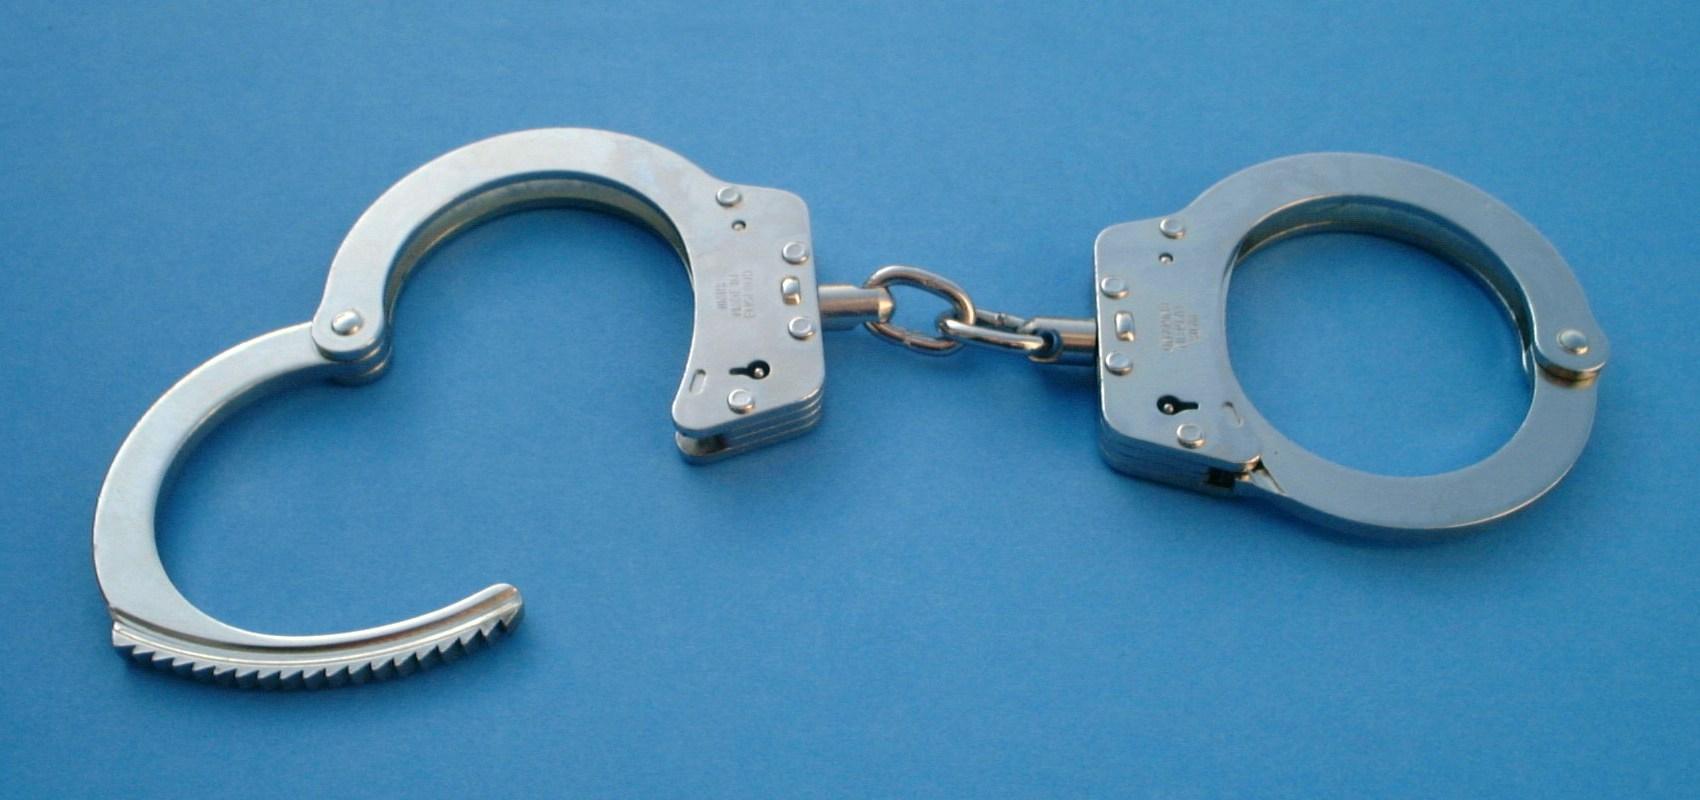 blameless-handcuffed-3